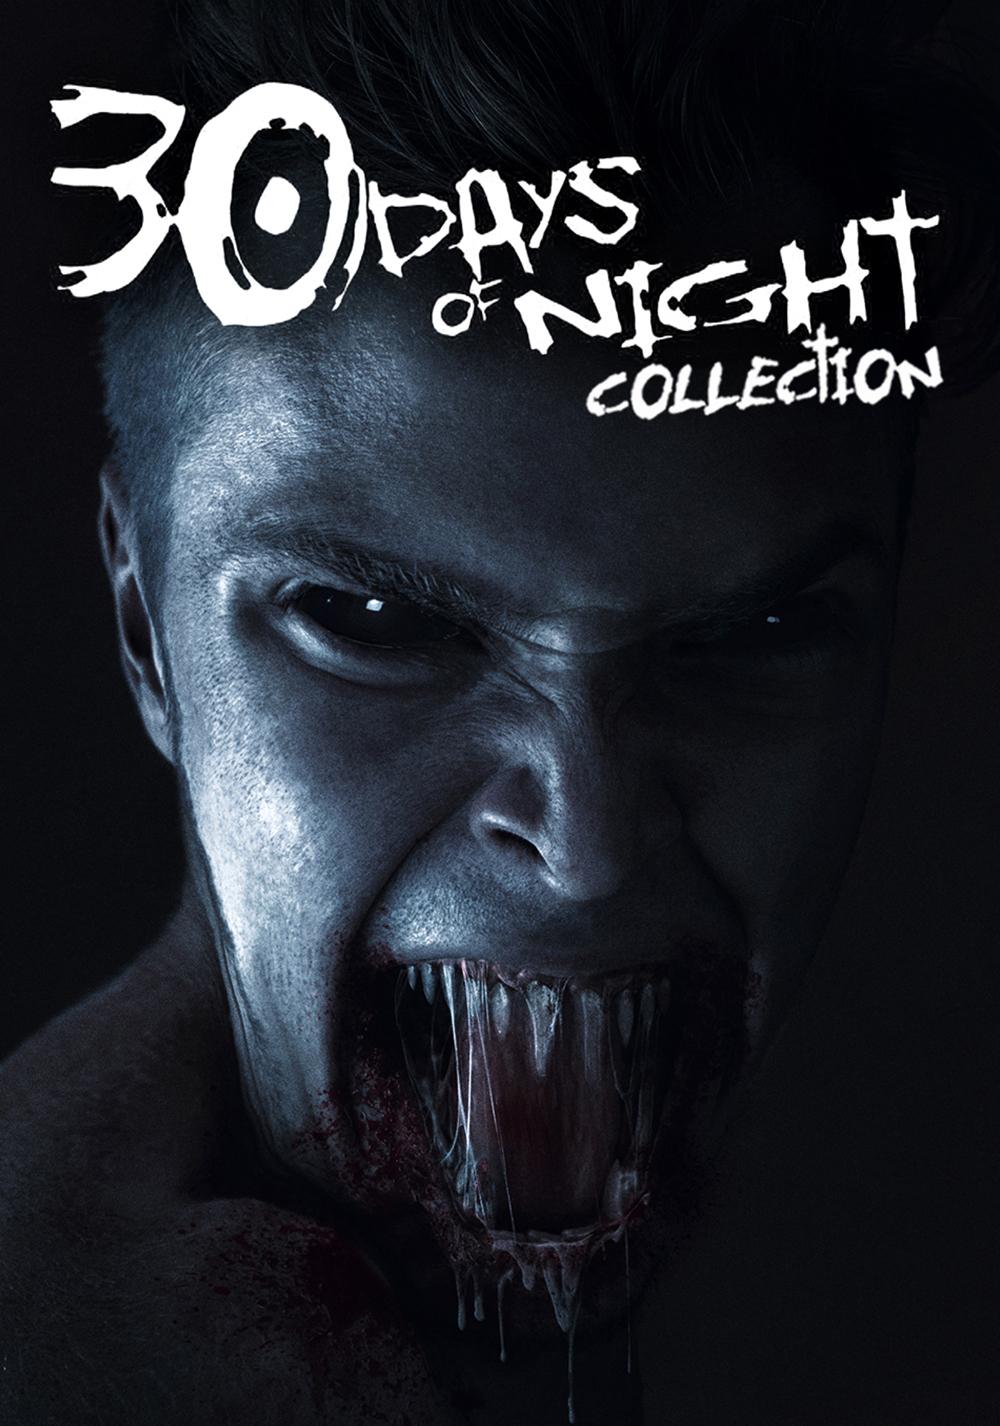 30 Days of Night Collection | Movie fanart | fanart.tv